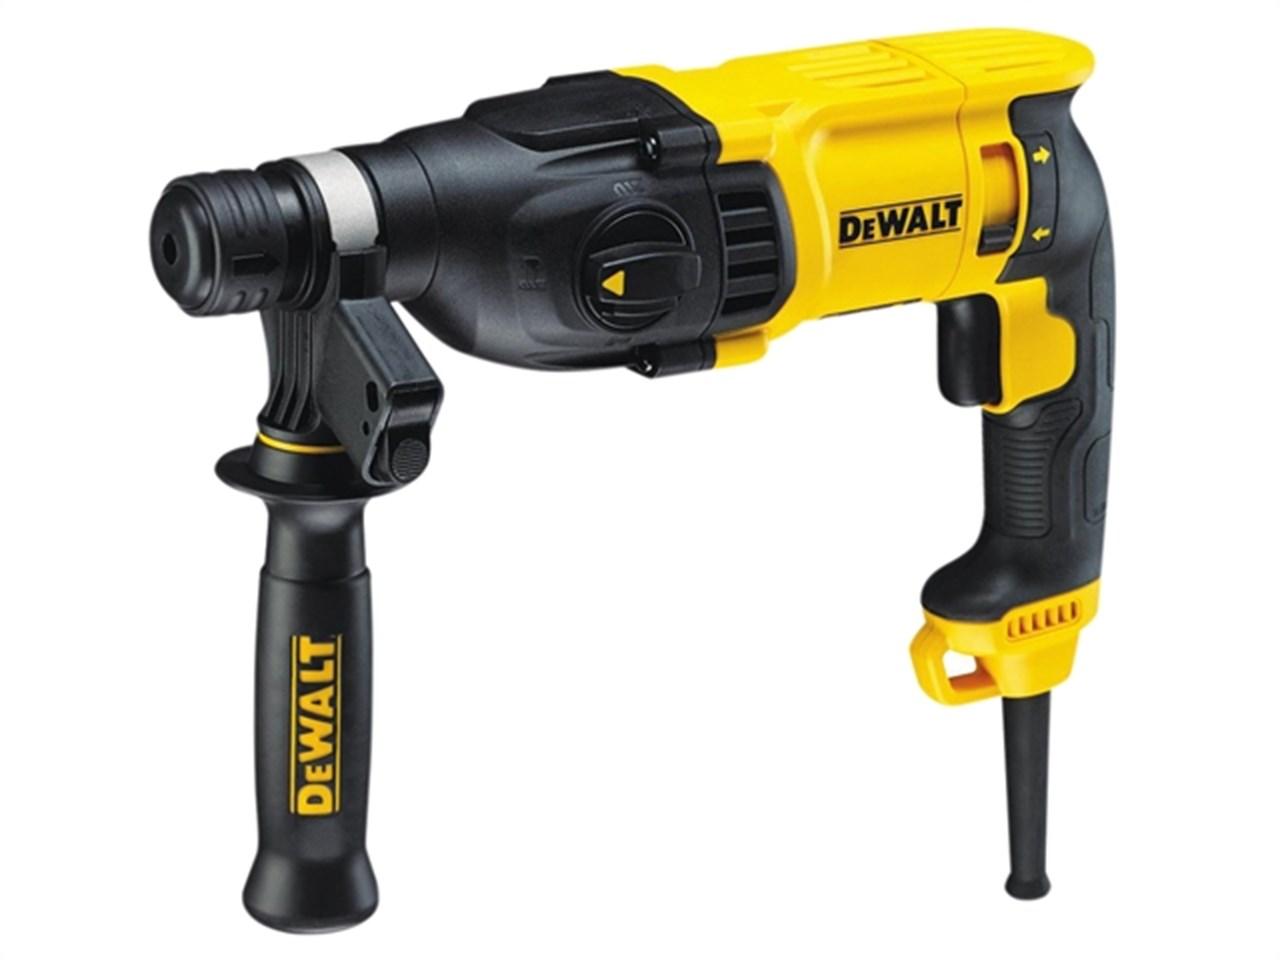 Dewalt SDS Hammer Drill 240V 26mm 3 Mode